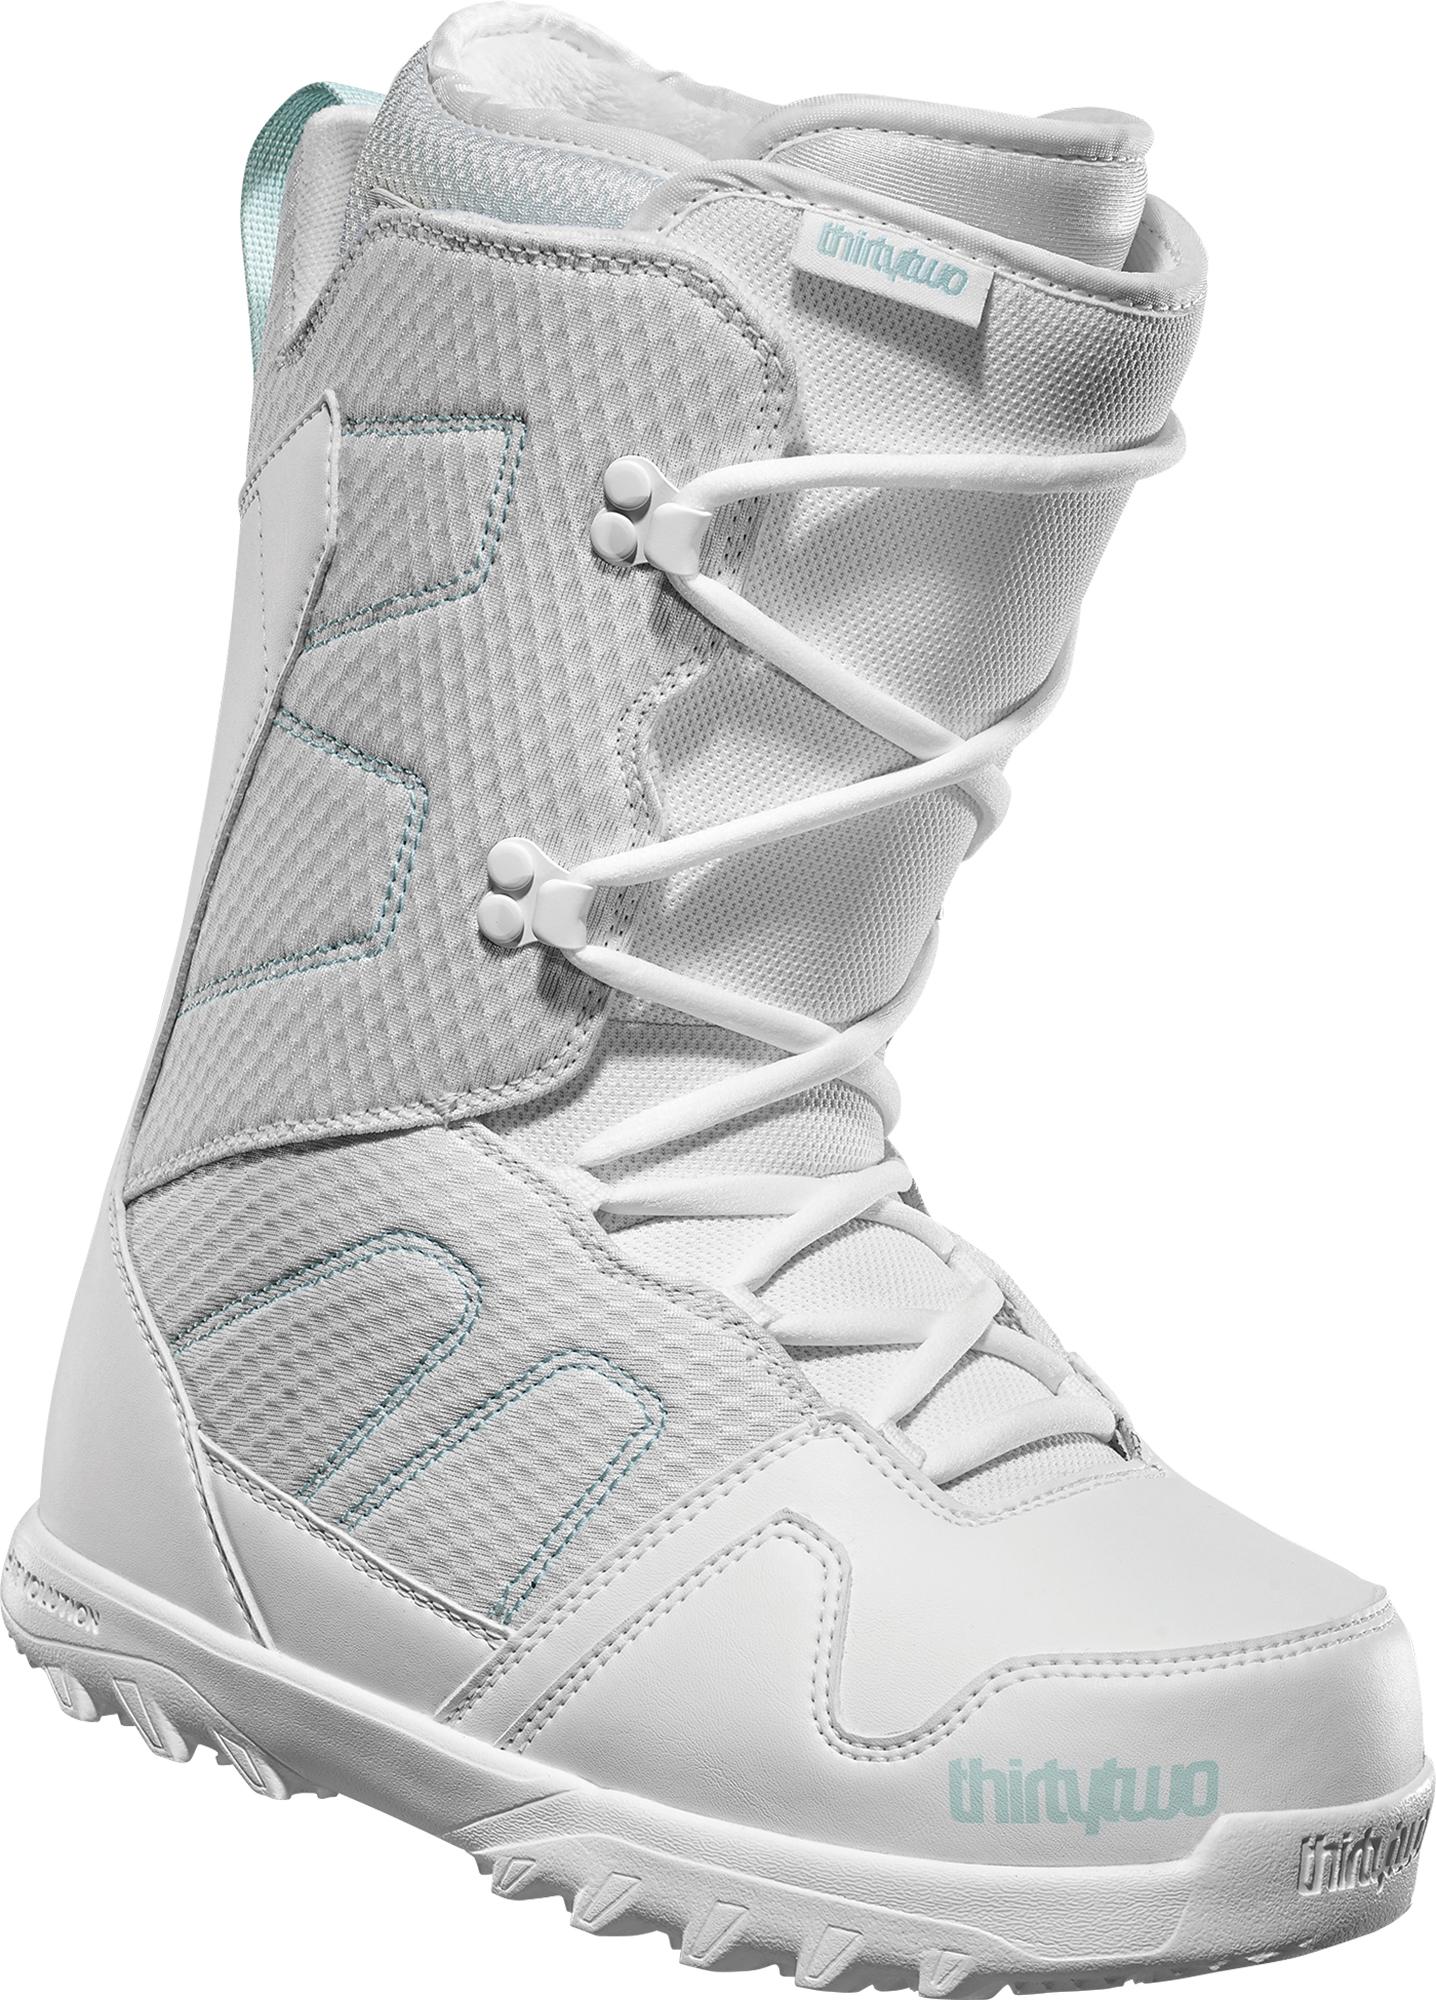 ThirtyTwo Сноубордические ботинки женские ThirtyTwo Exit '18, размер 39